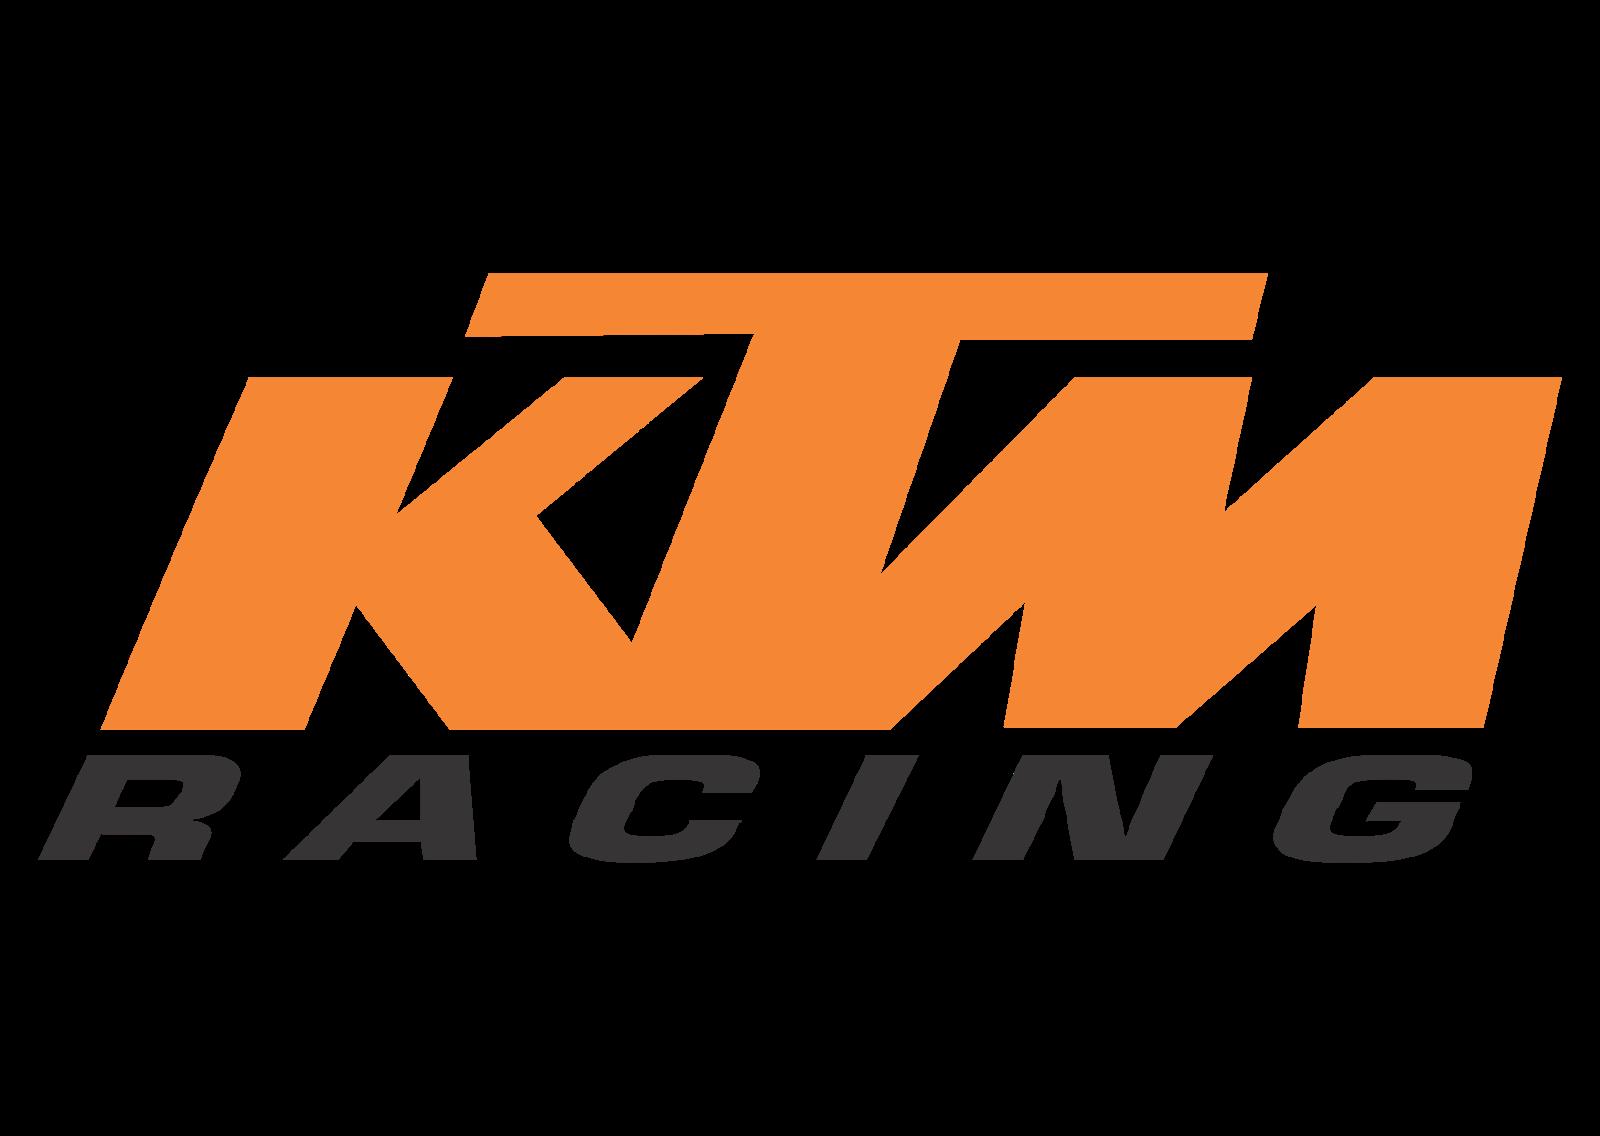 image logo ktm